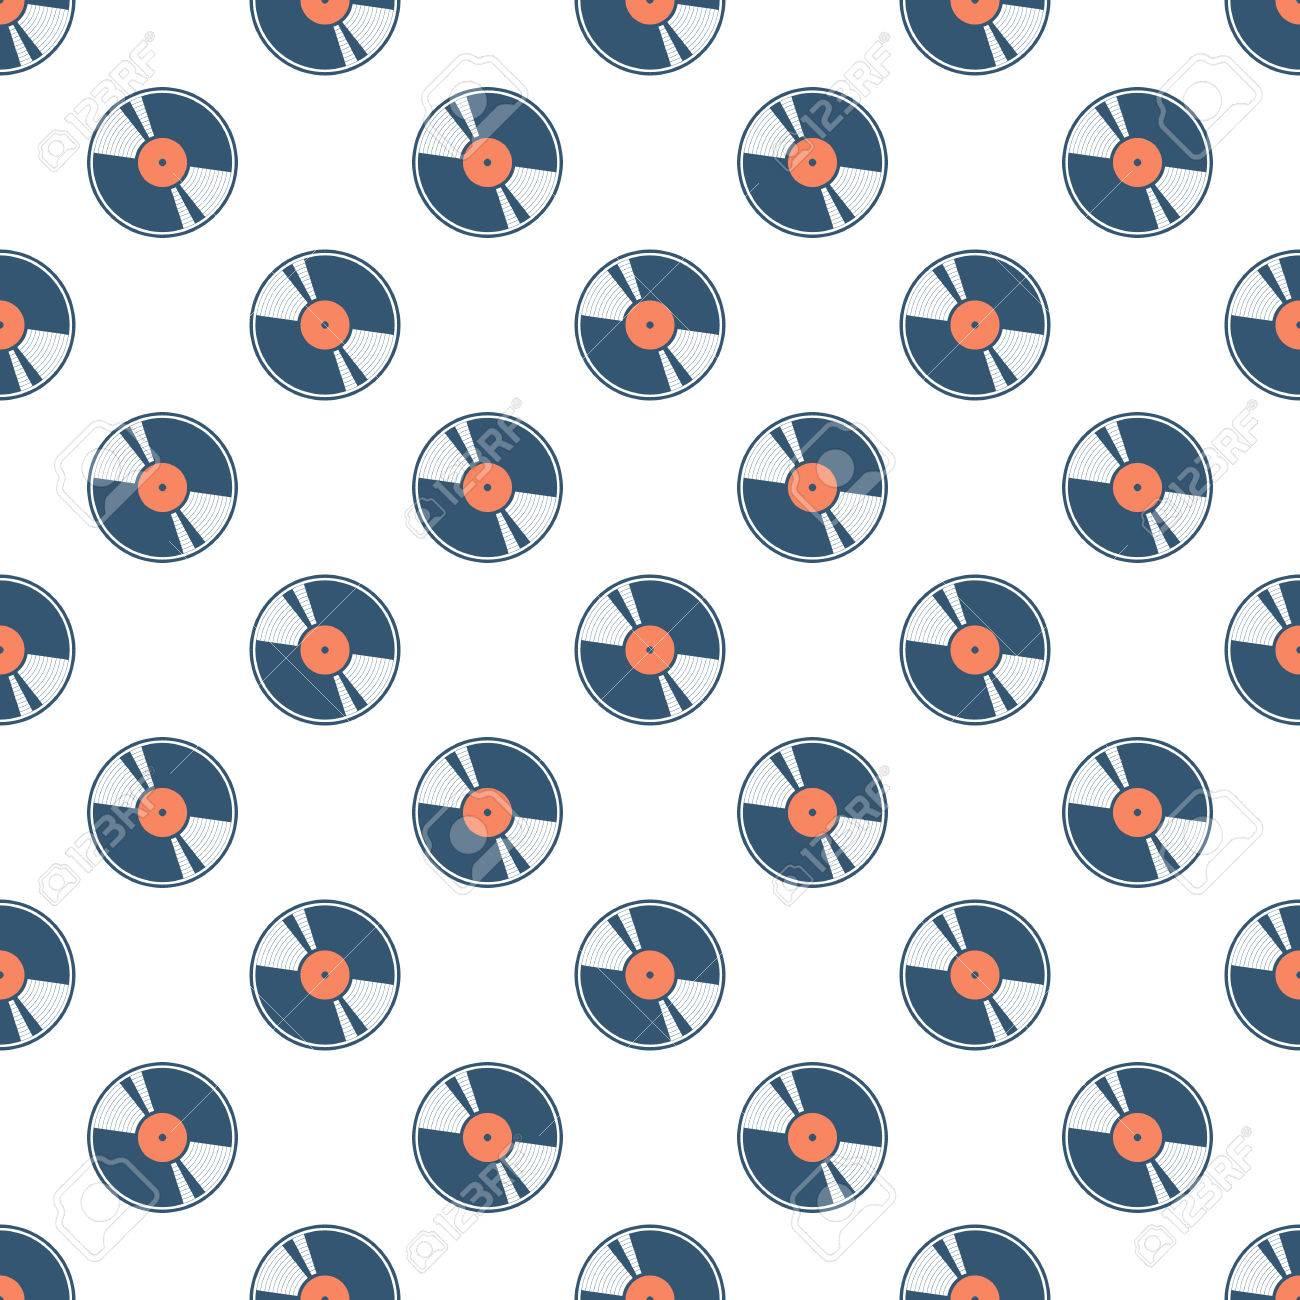 Color vinyl record seamless pattern